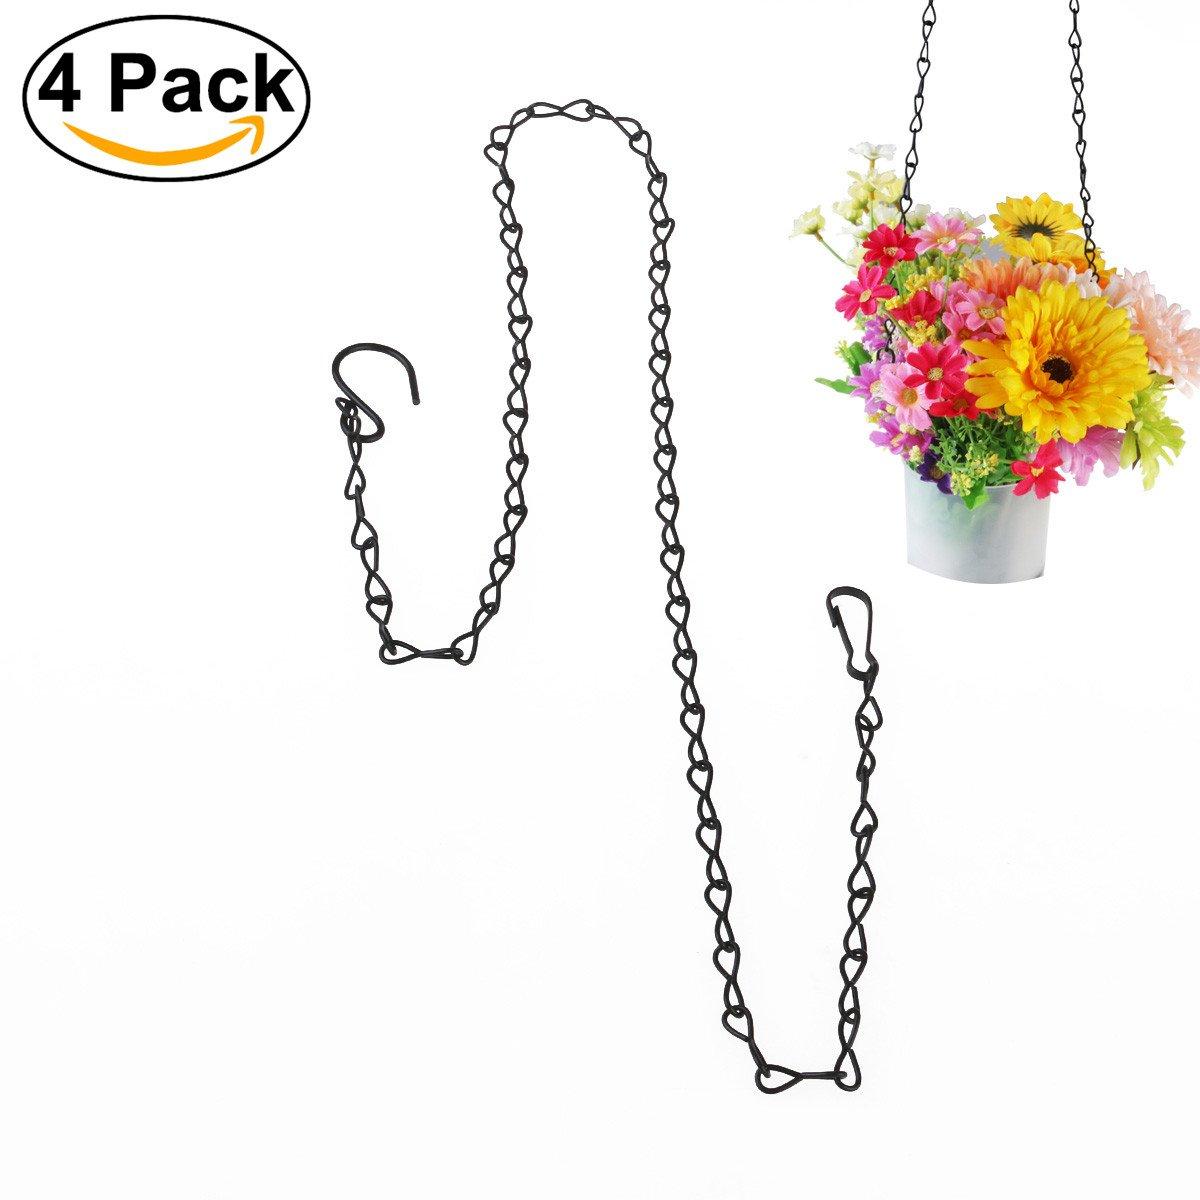 UEETEK 4pcs Hanging Chain for Bird Feeders Planters Lanterns Flower Basket 35-inch